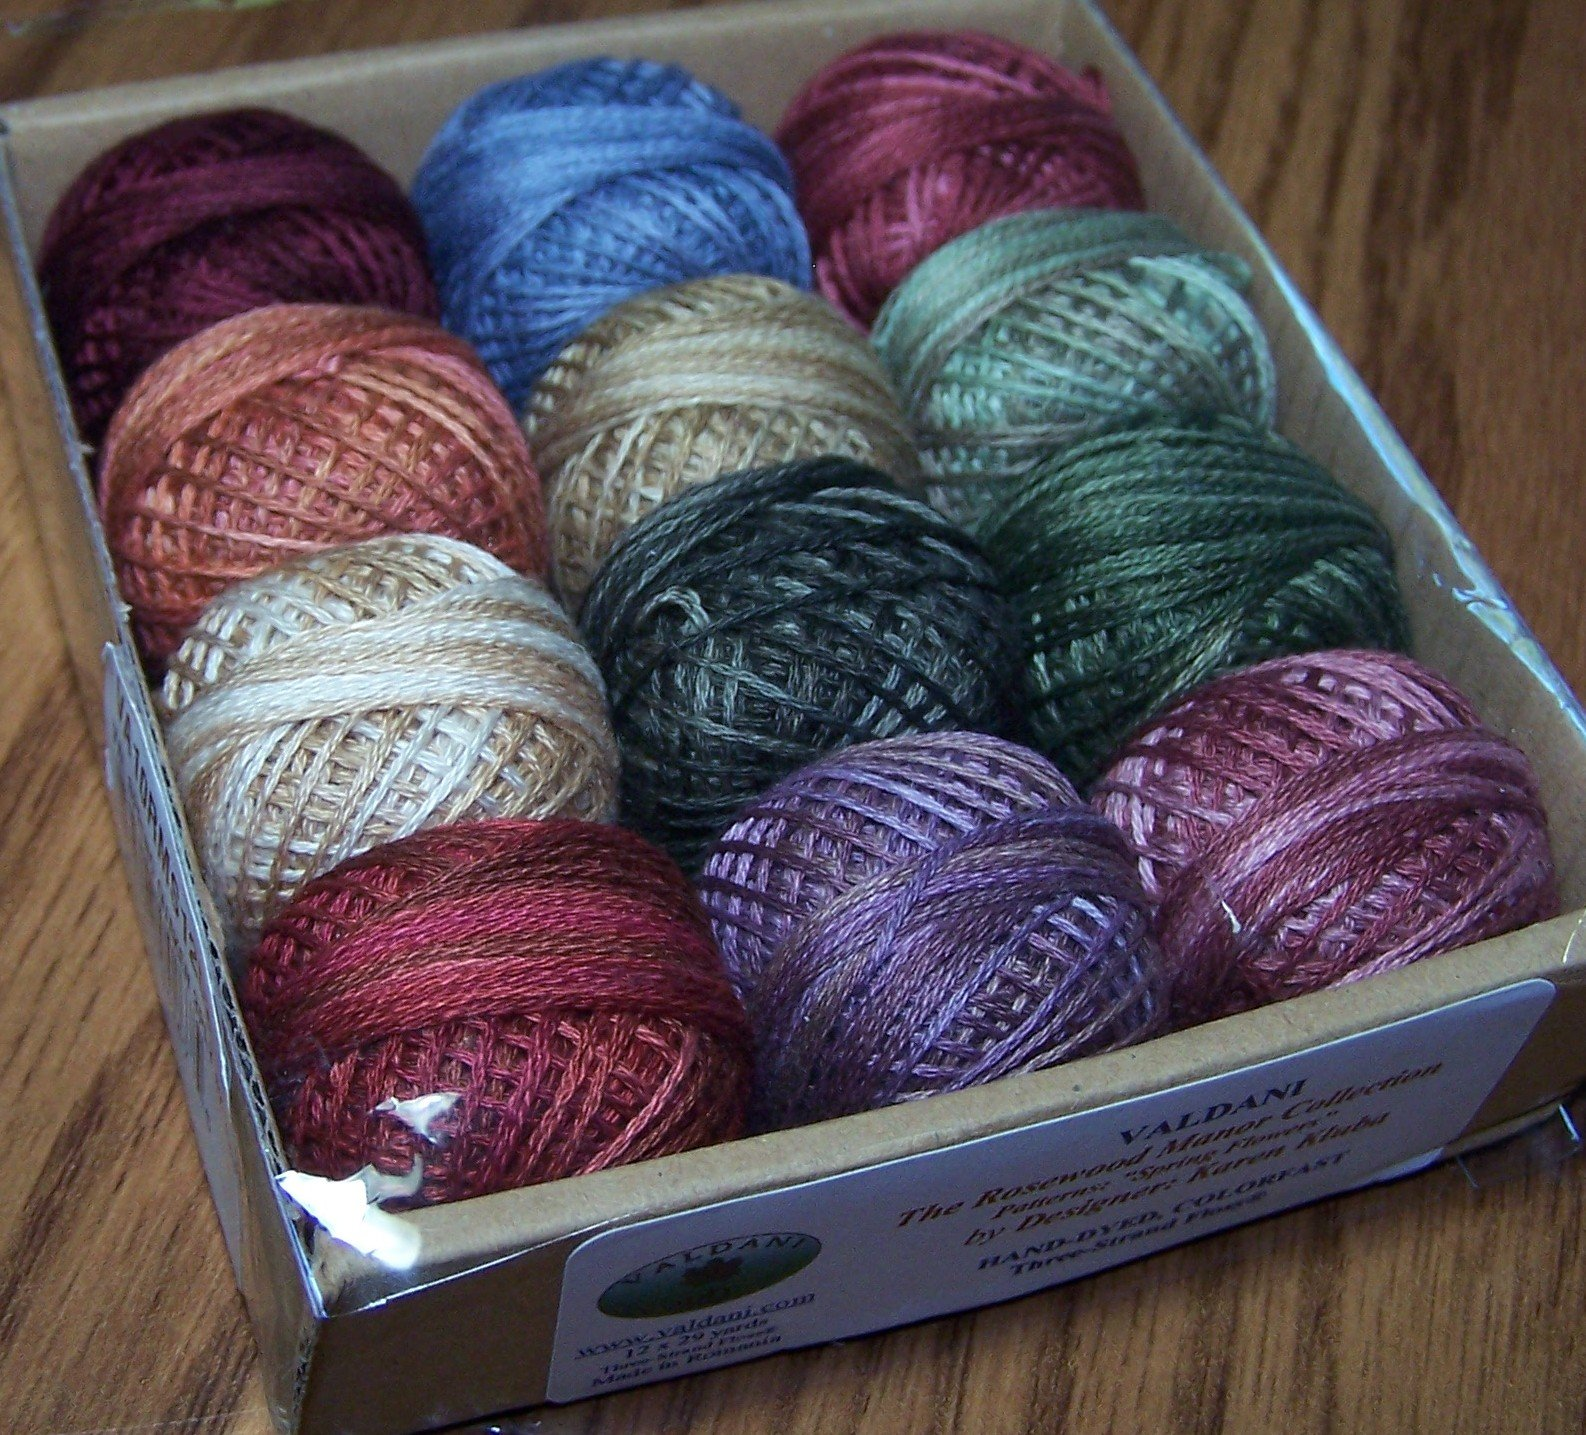 Valdani 3-strand cotton floss - Spring Quakers - Rosewood Manor by Valdani